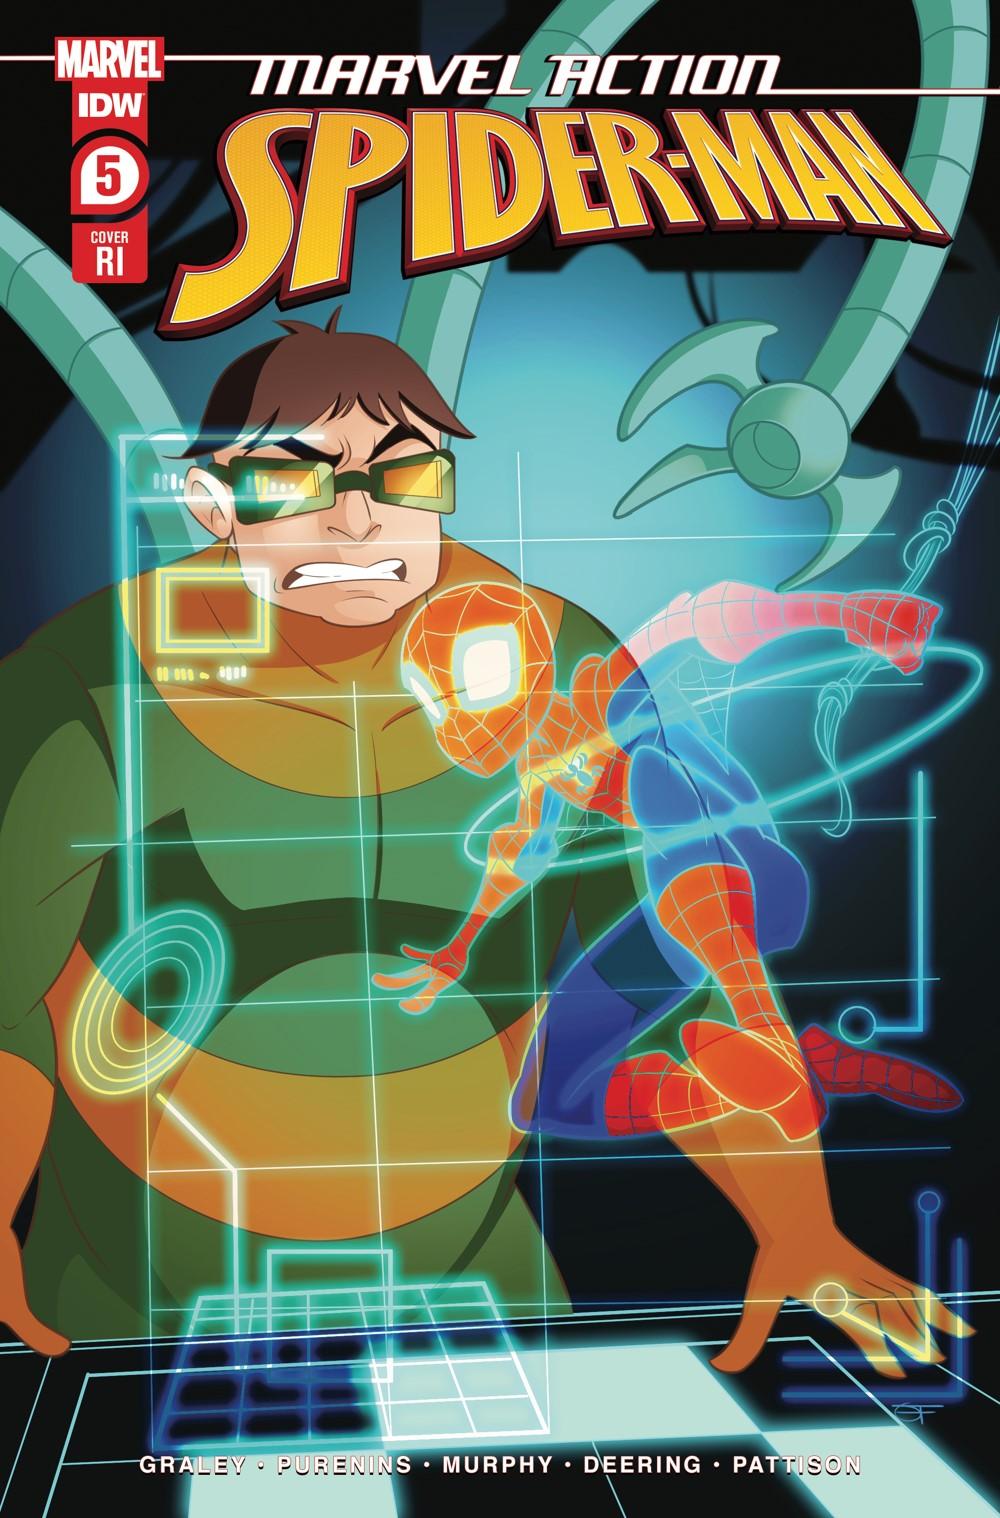 SpidermanV3-05_cvrRI ComicList Previews: MARVEL ACTION SPIDER-MAN VOLUME 3 #5